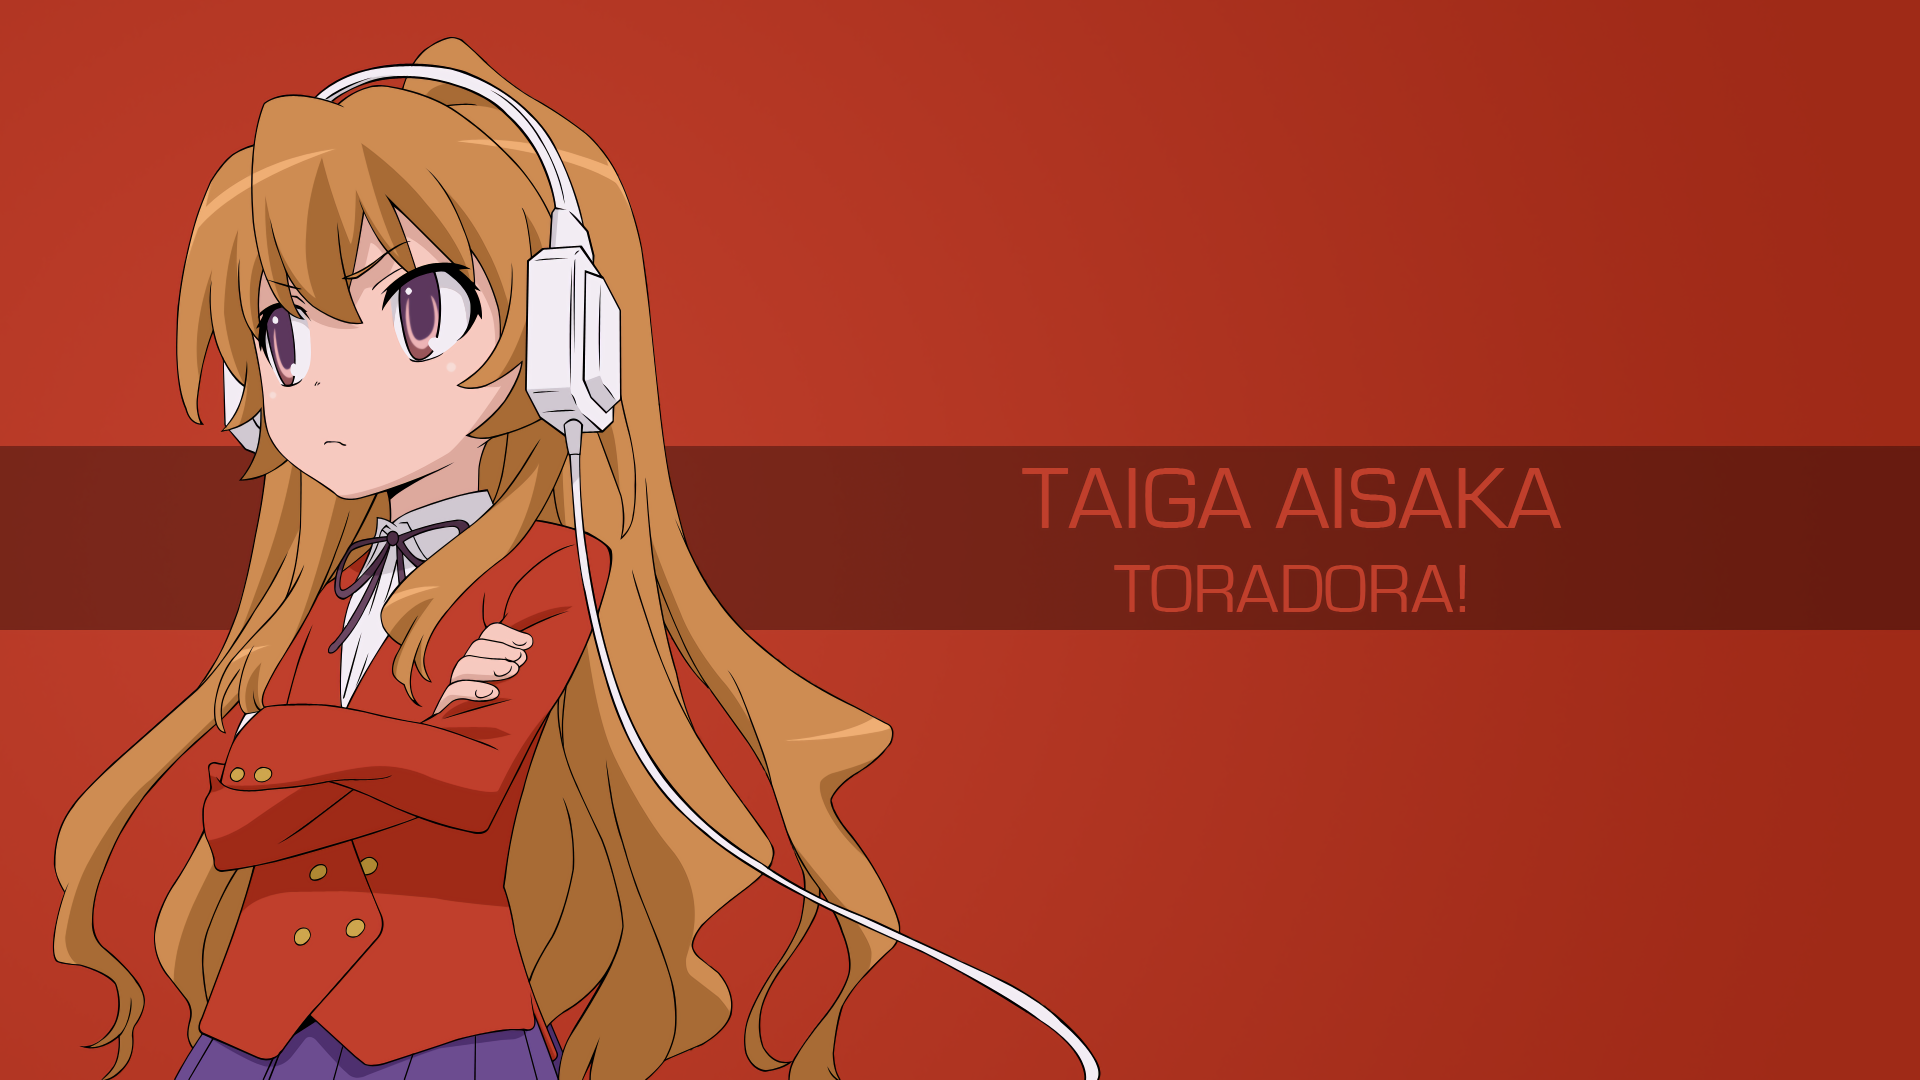 Toradora 4k ultra hd wallpaper background image - Toradora anime wallpaper ...